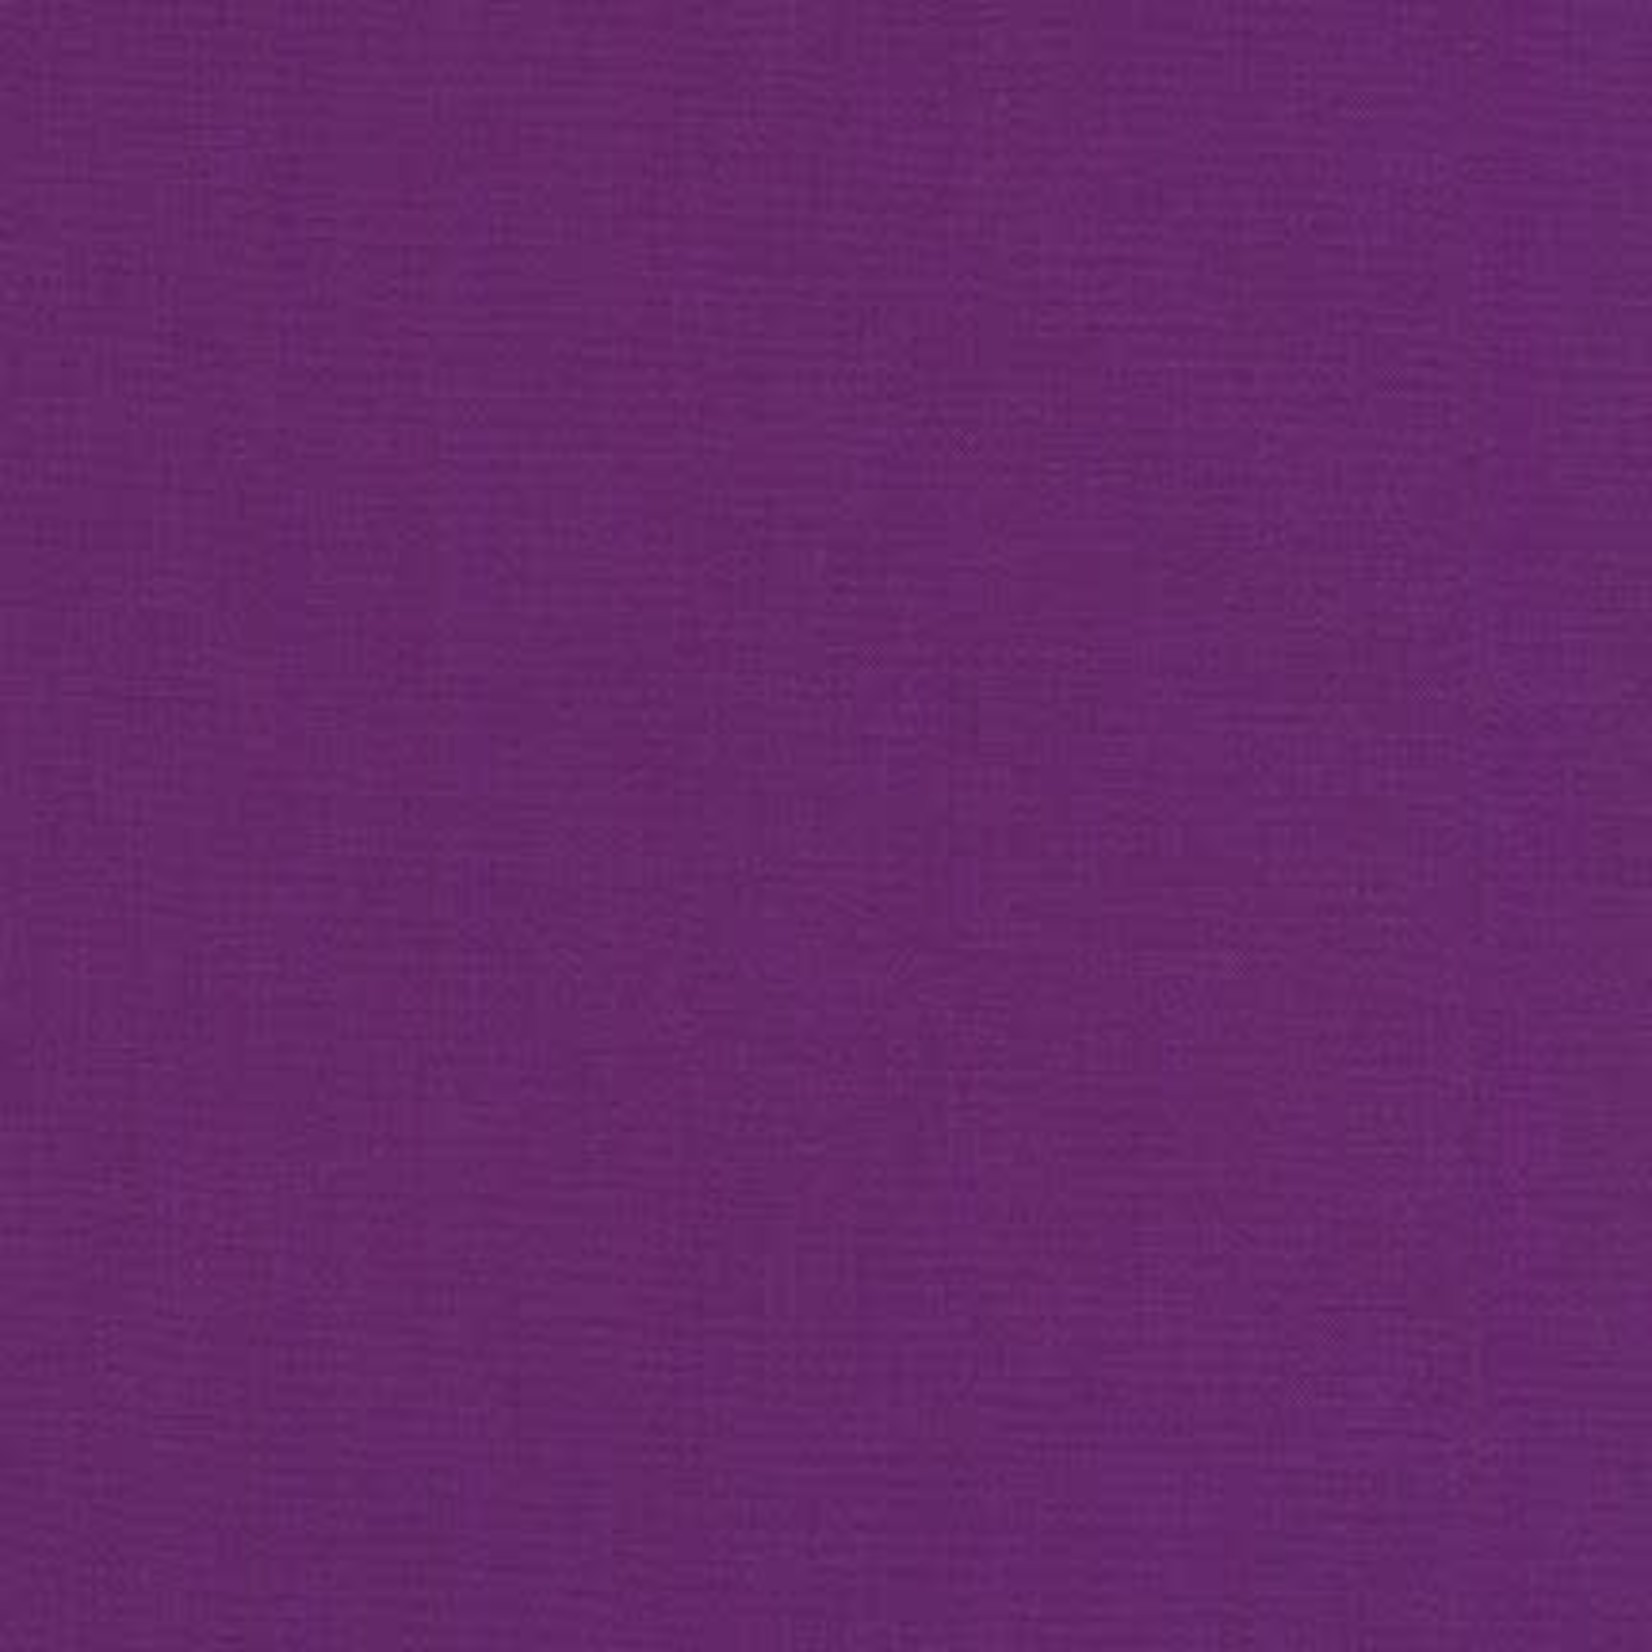 KONA KONA  K001-80 MULBERRY, PER CM OR $14/M